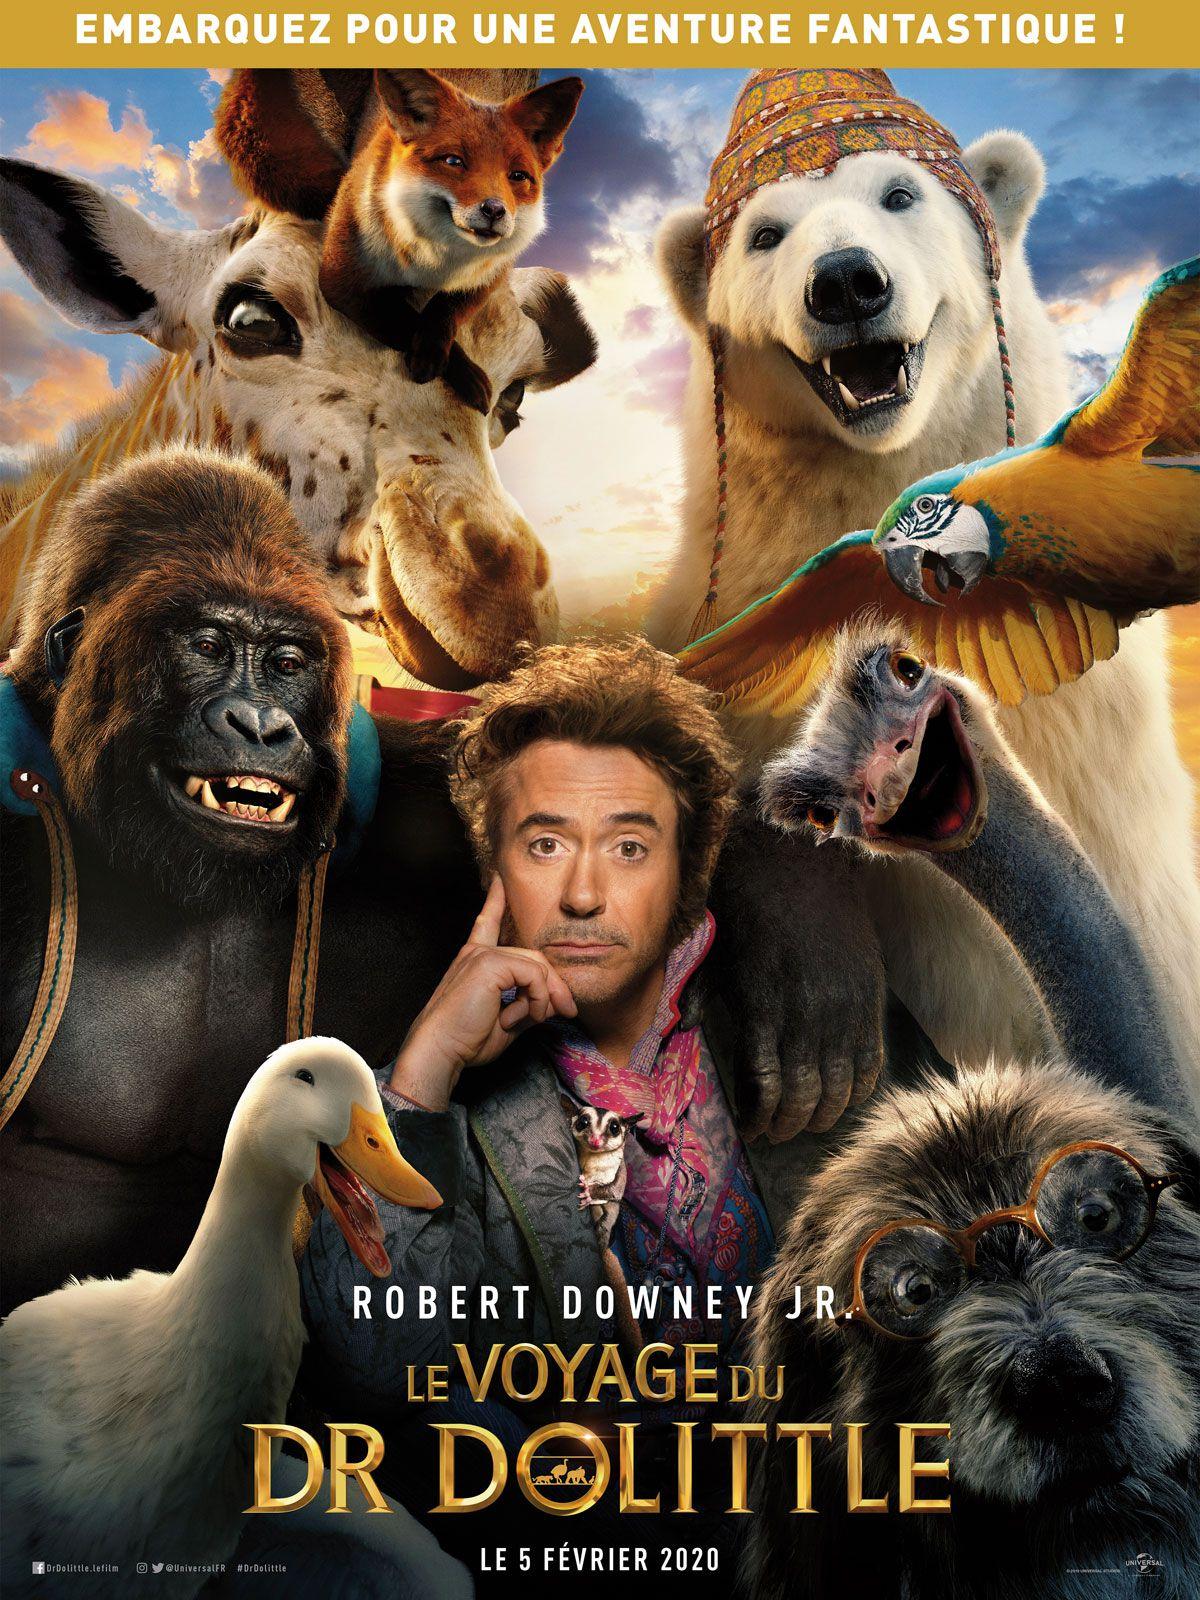 Le Voyage du Dr Dolittle - Film (2020)